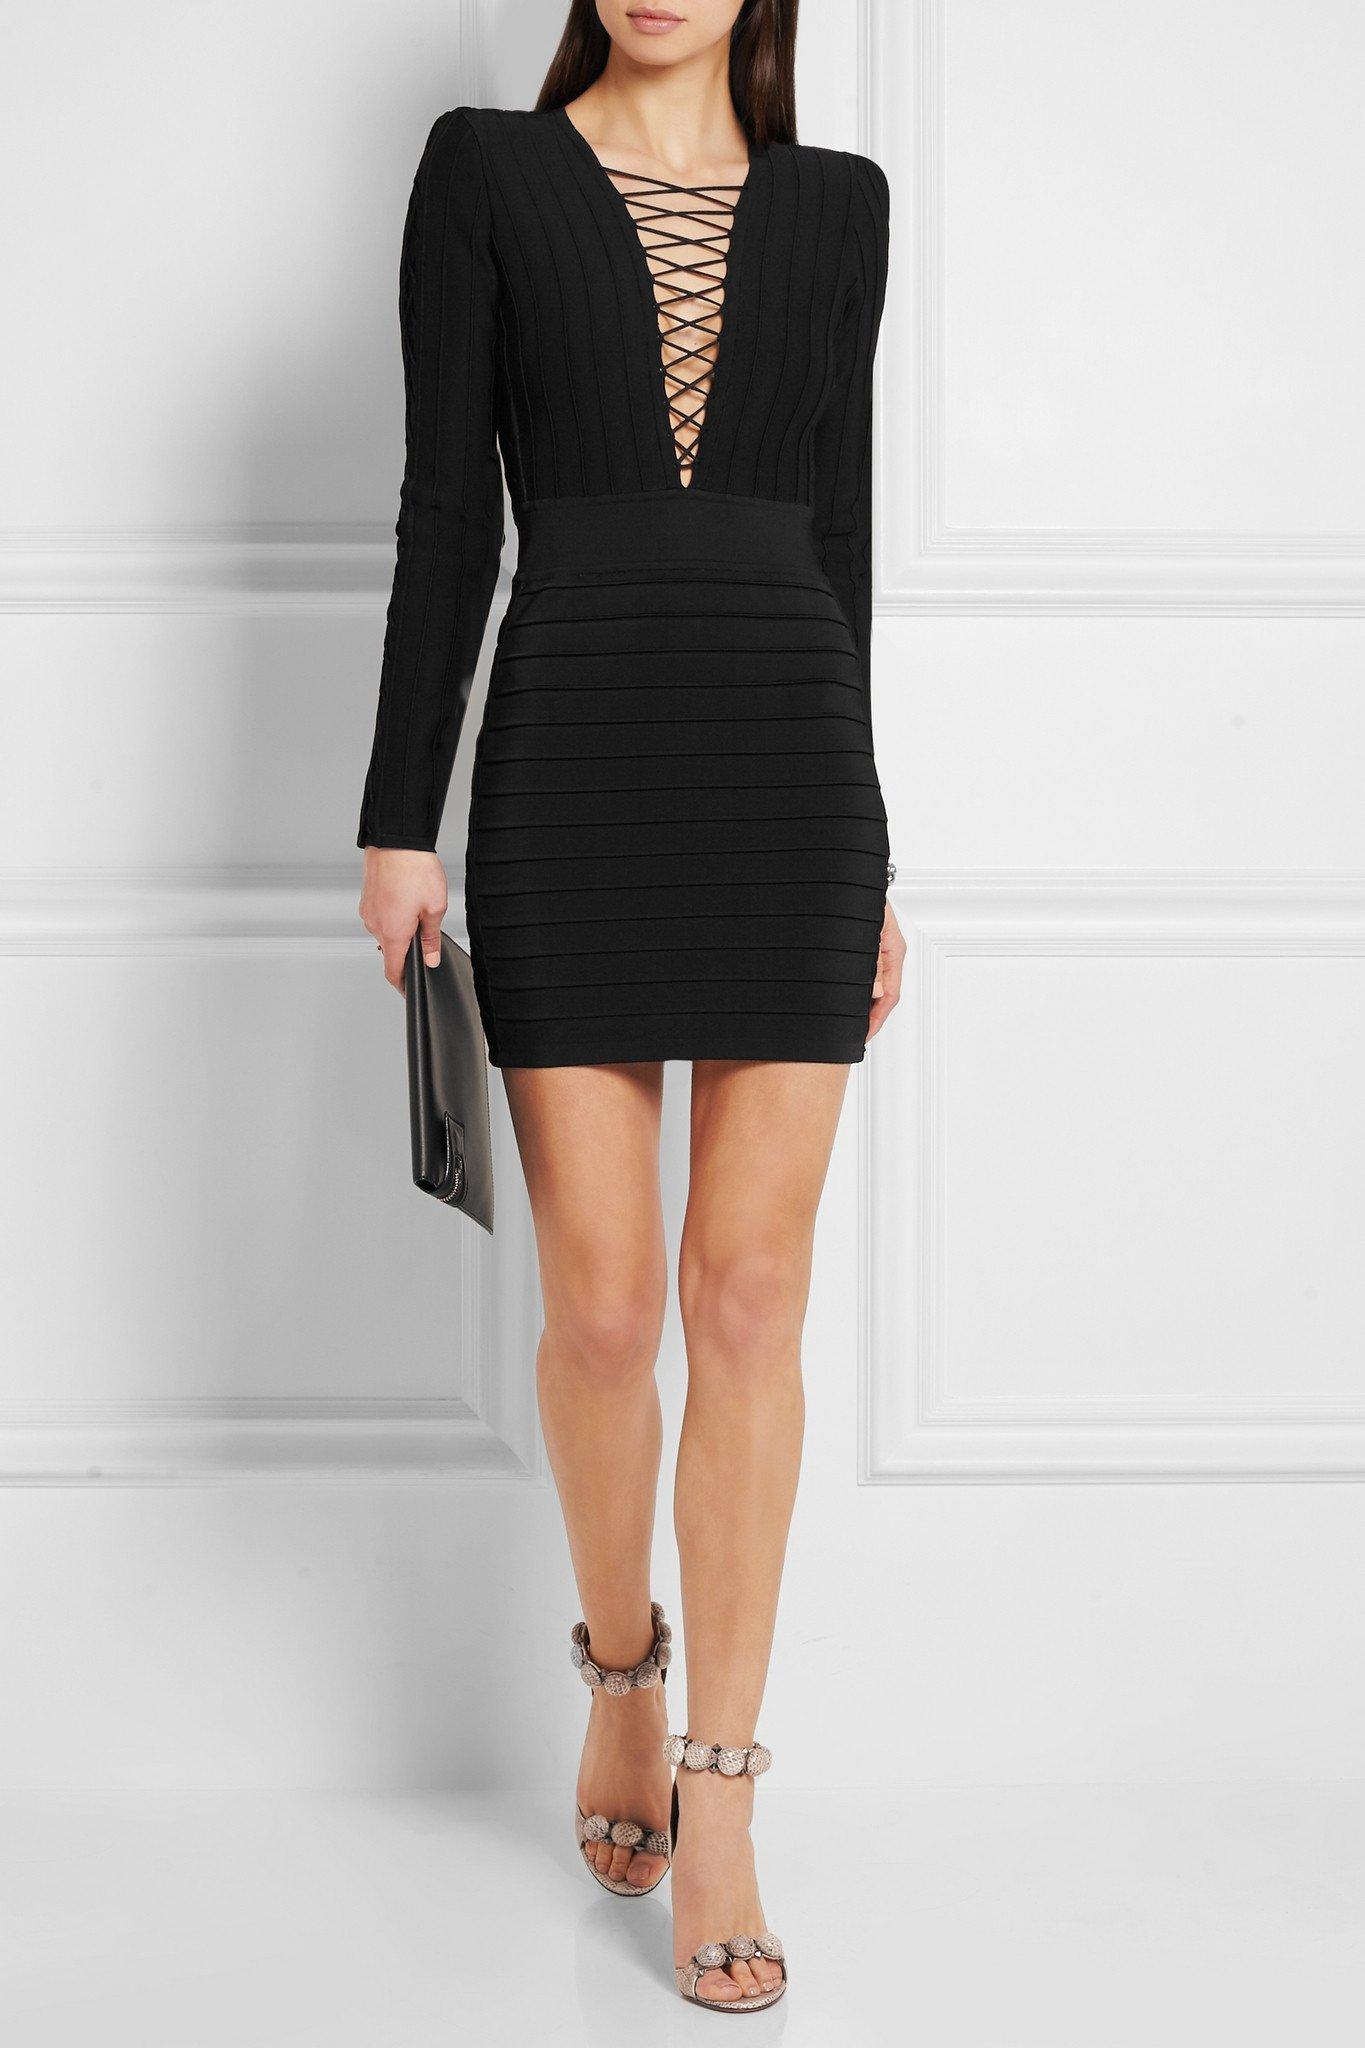 79b9266cfda5 Lyst - Balmain Lace-up Ribbed Stretch-knit Mini Dress in Black